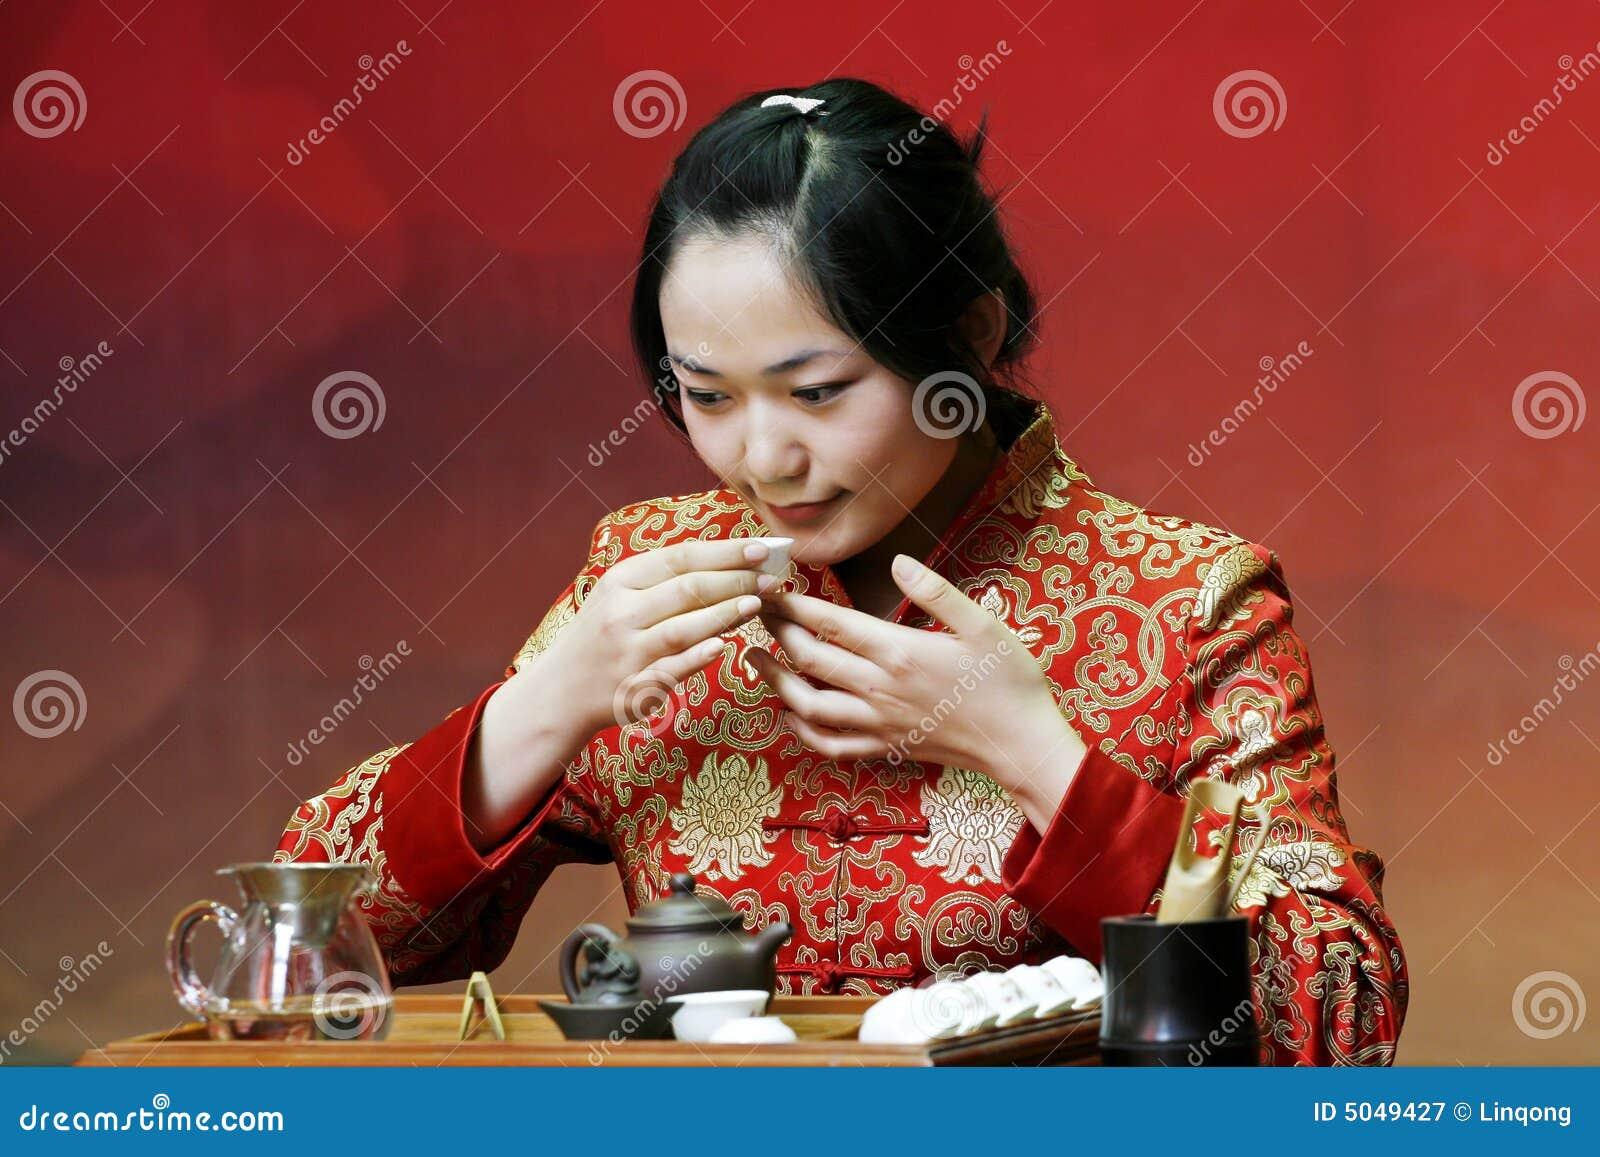 Tea Art Of China Royalty Free Stock Photography Image